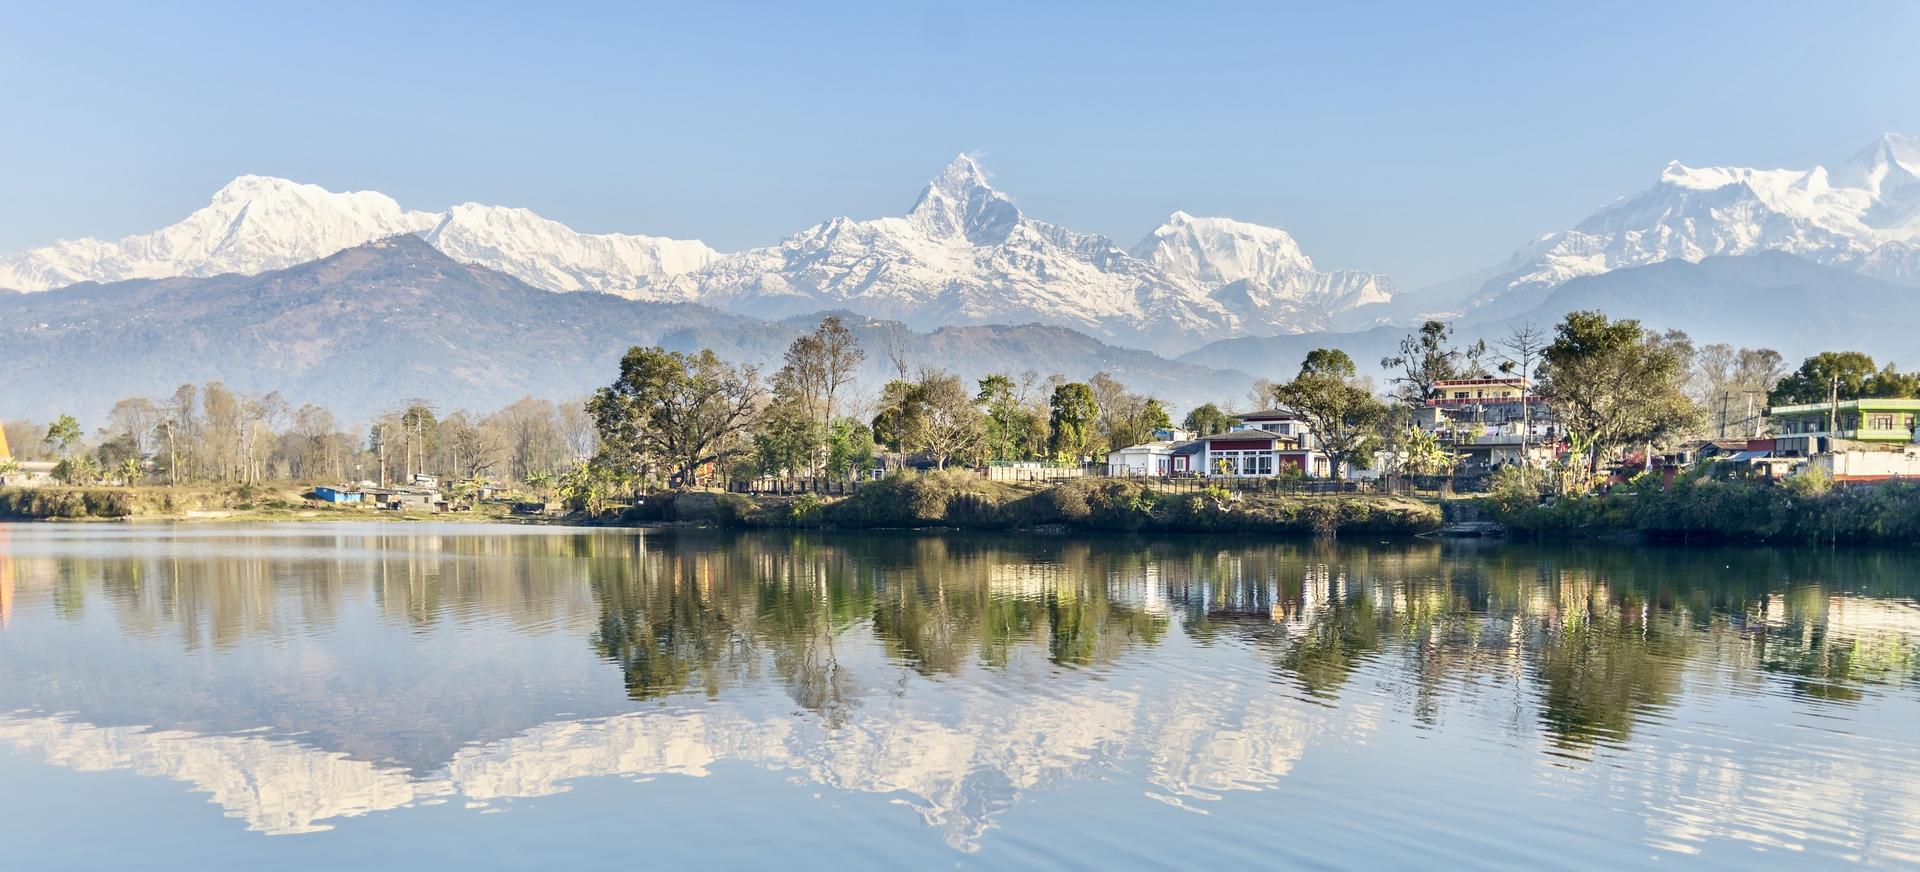 Kathmandu Pokhara 3 day Trek with Chitwan Safari